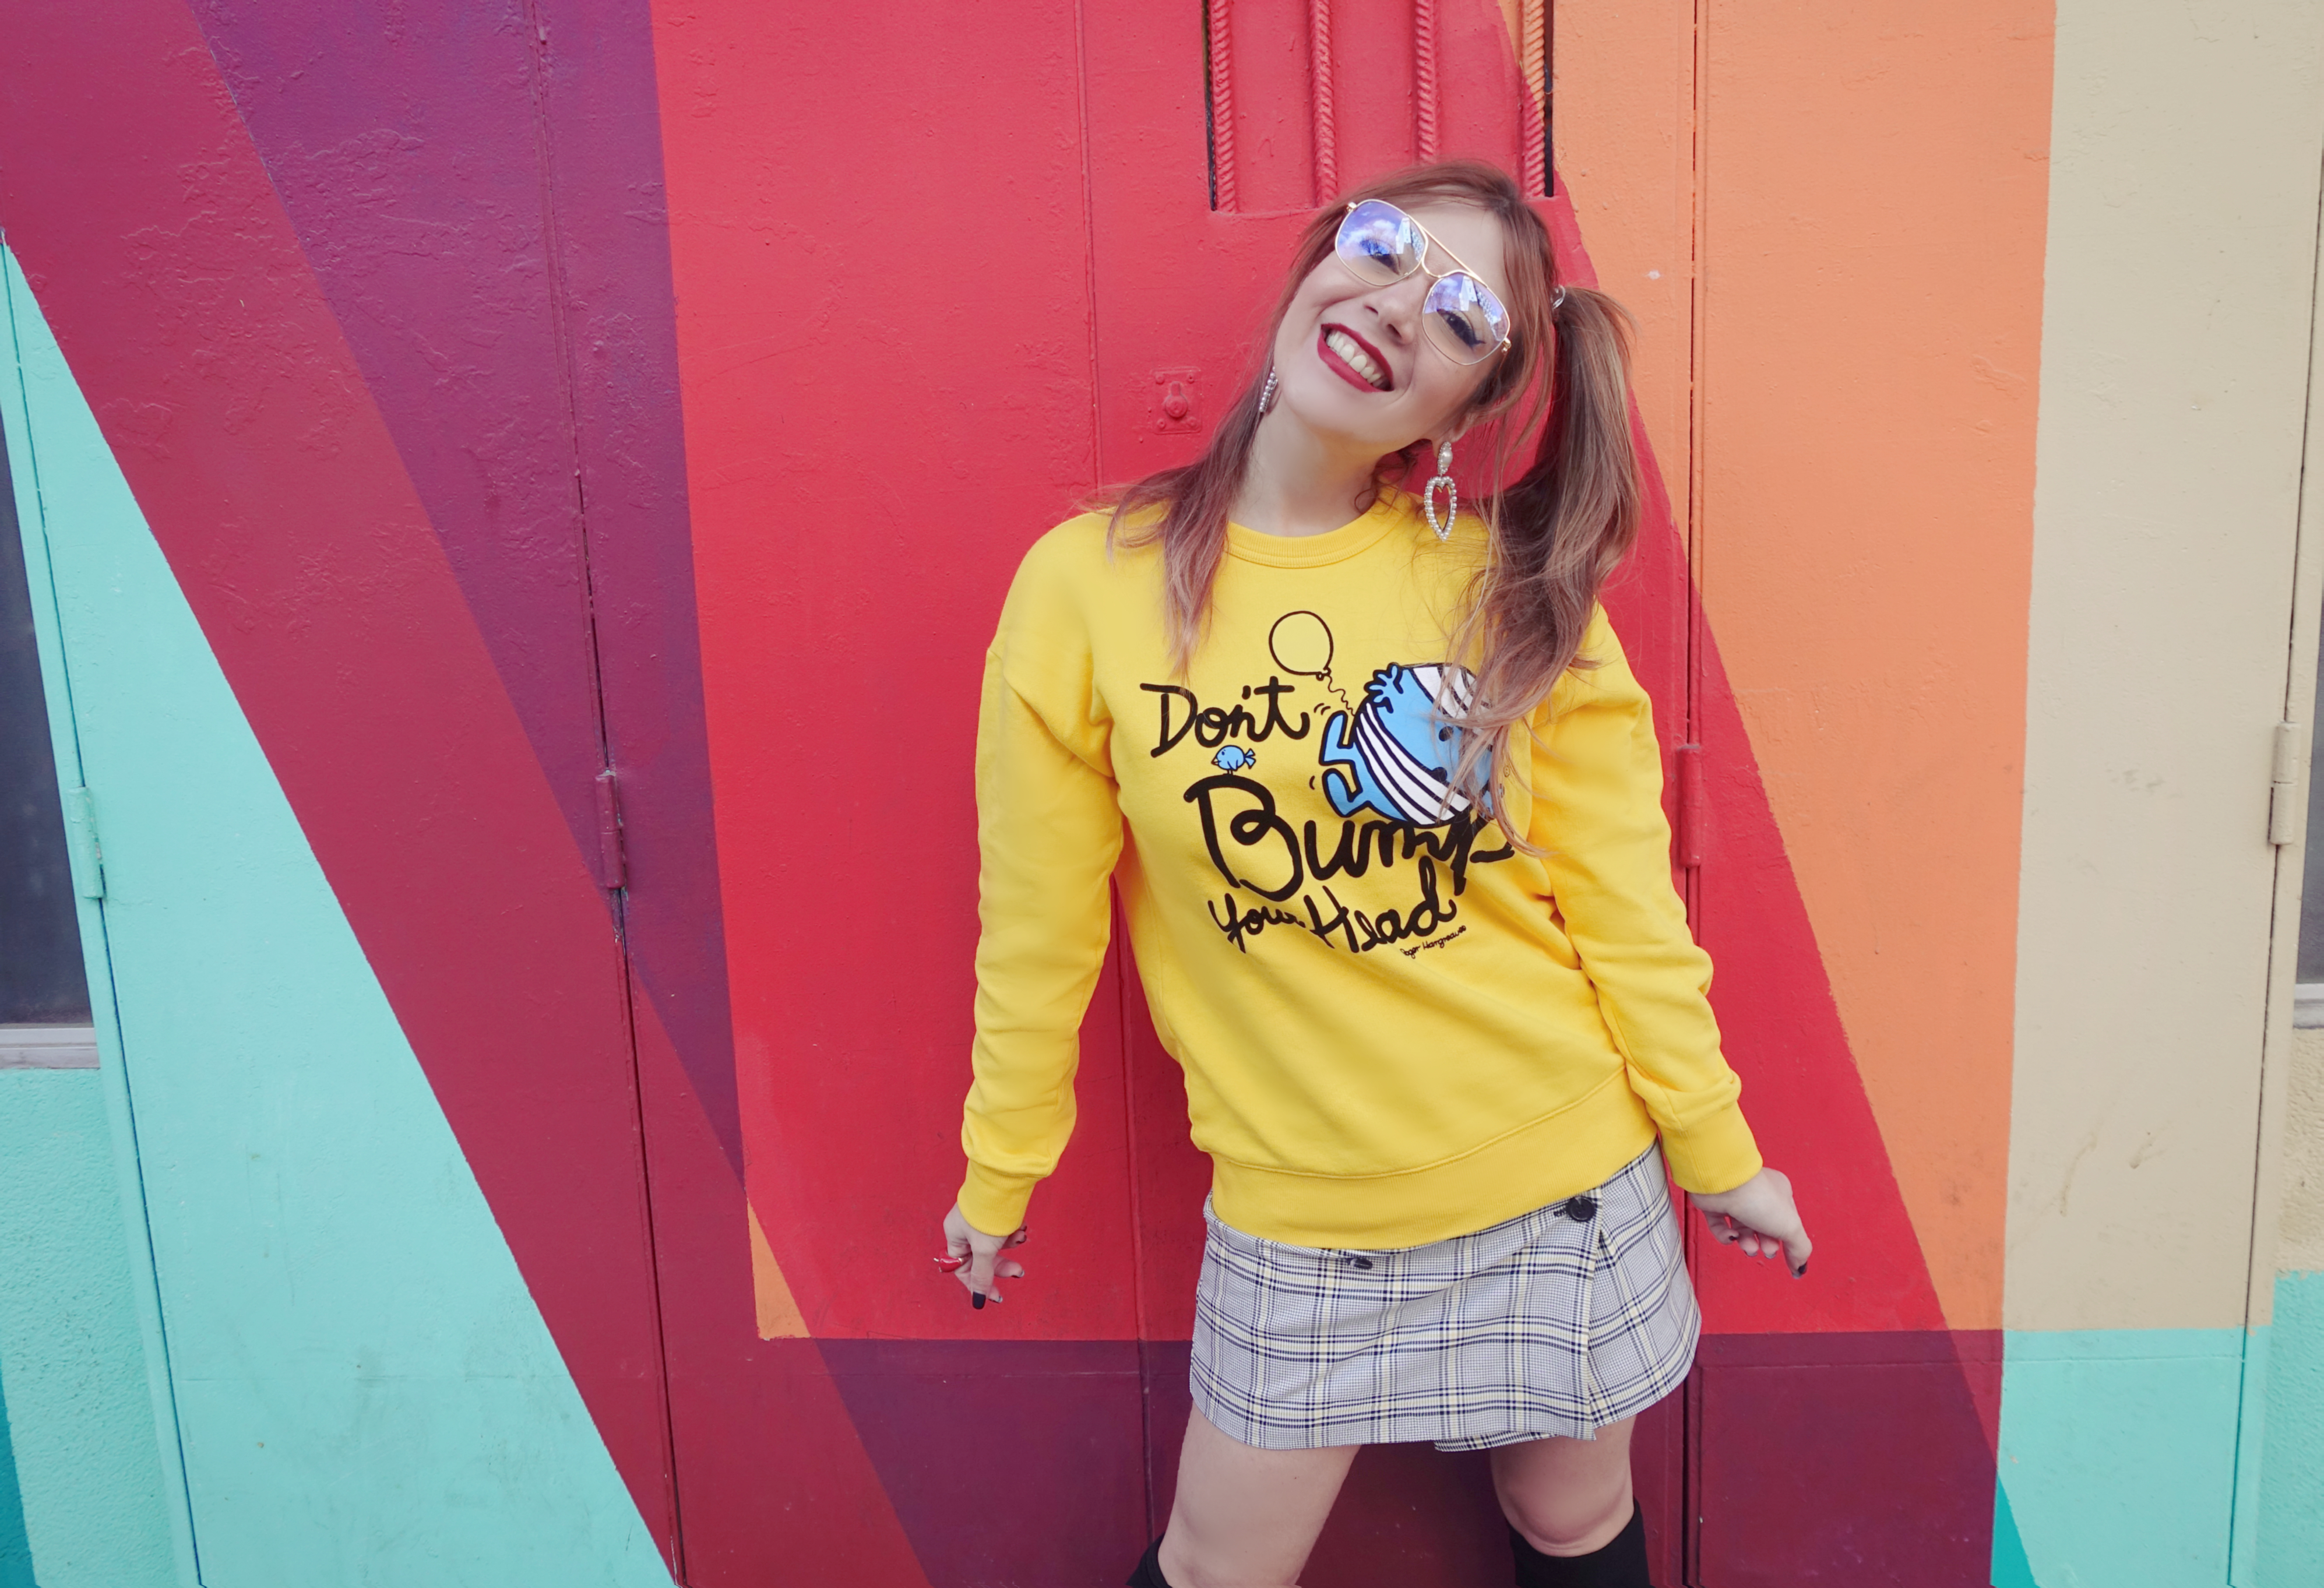 hk-chocoolate-sweaters-Chicadicta-influencer-PiensaenChic-blog-de-moda-falda de cuadros-outfit-amarillo-cute-style-Chic-adicta-Piensa-en-Chic